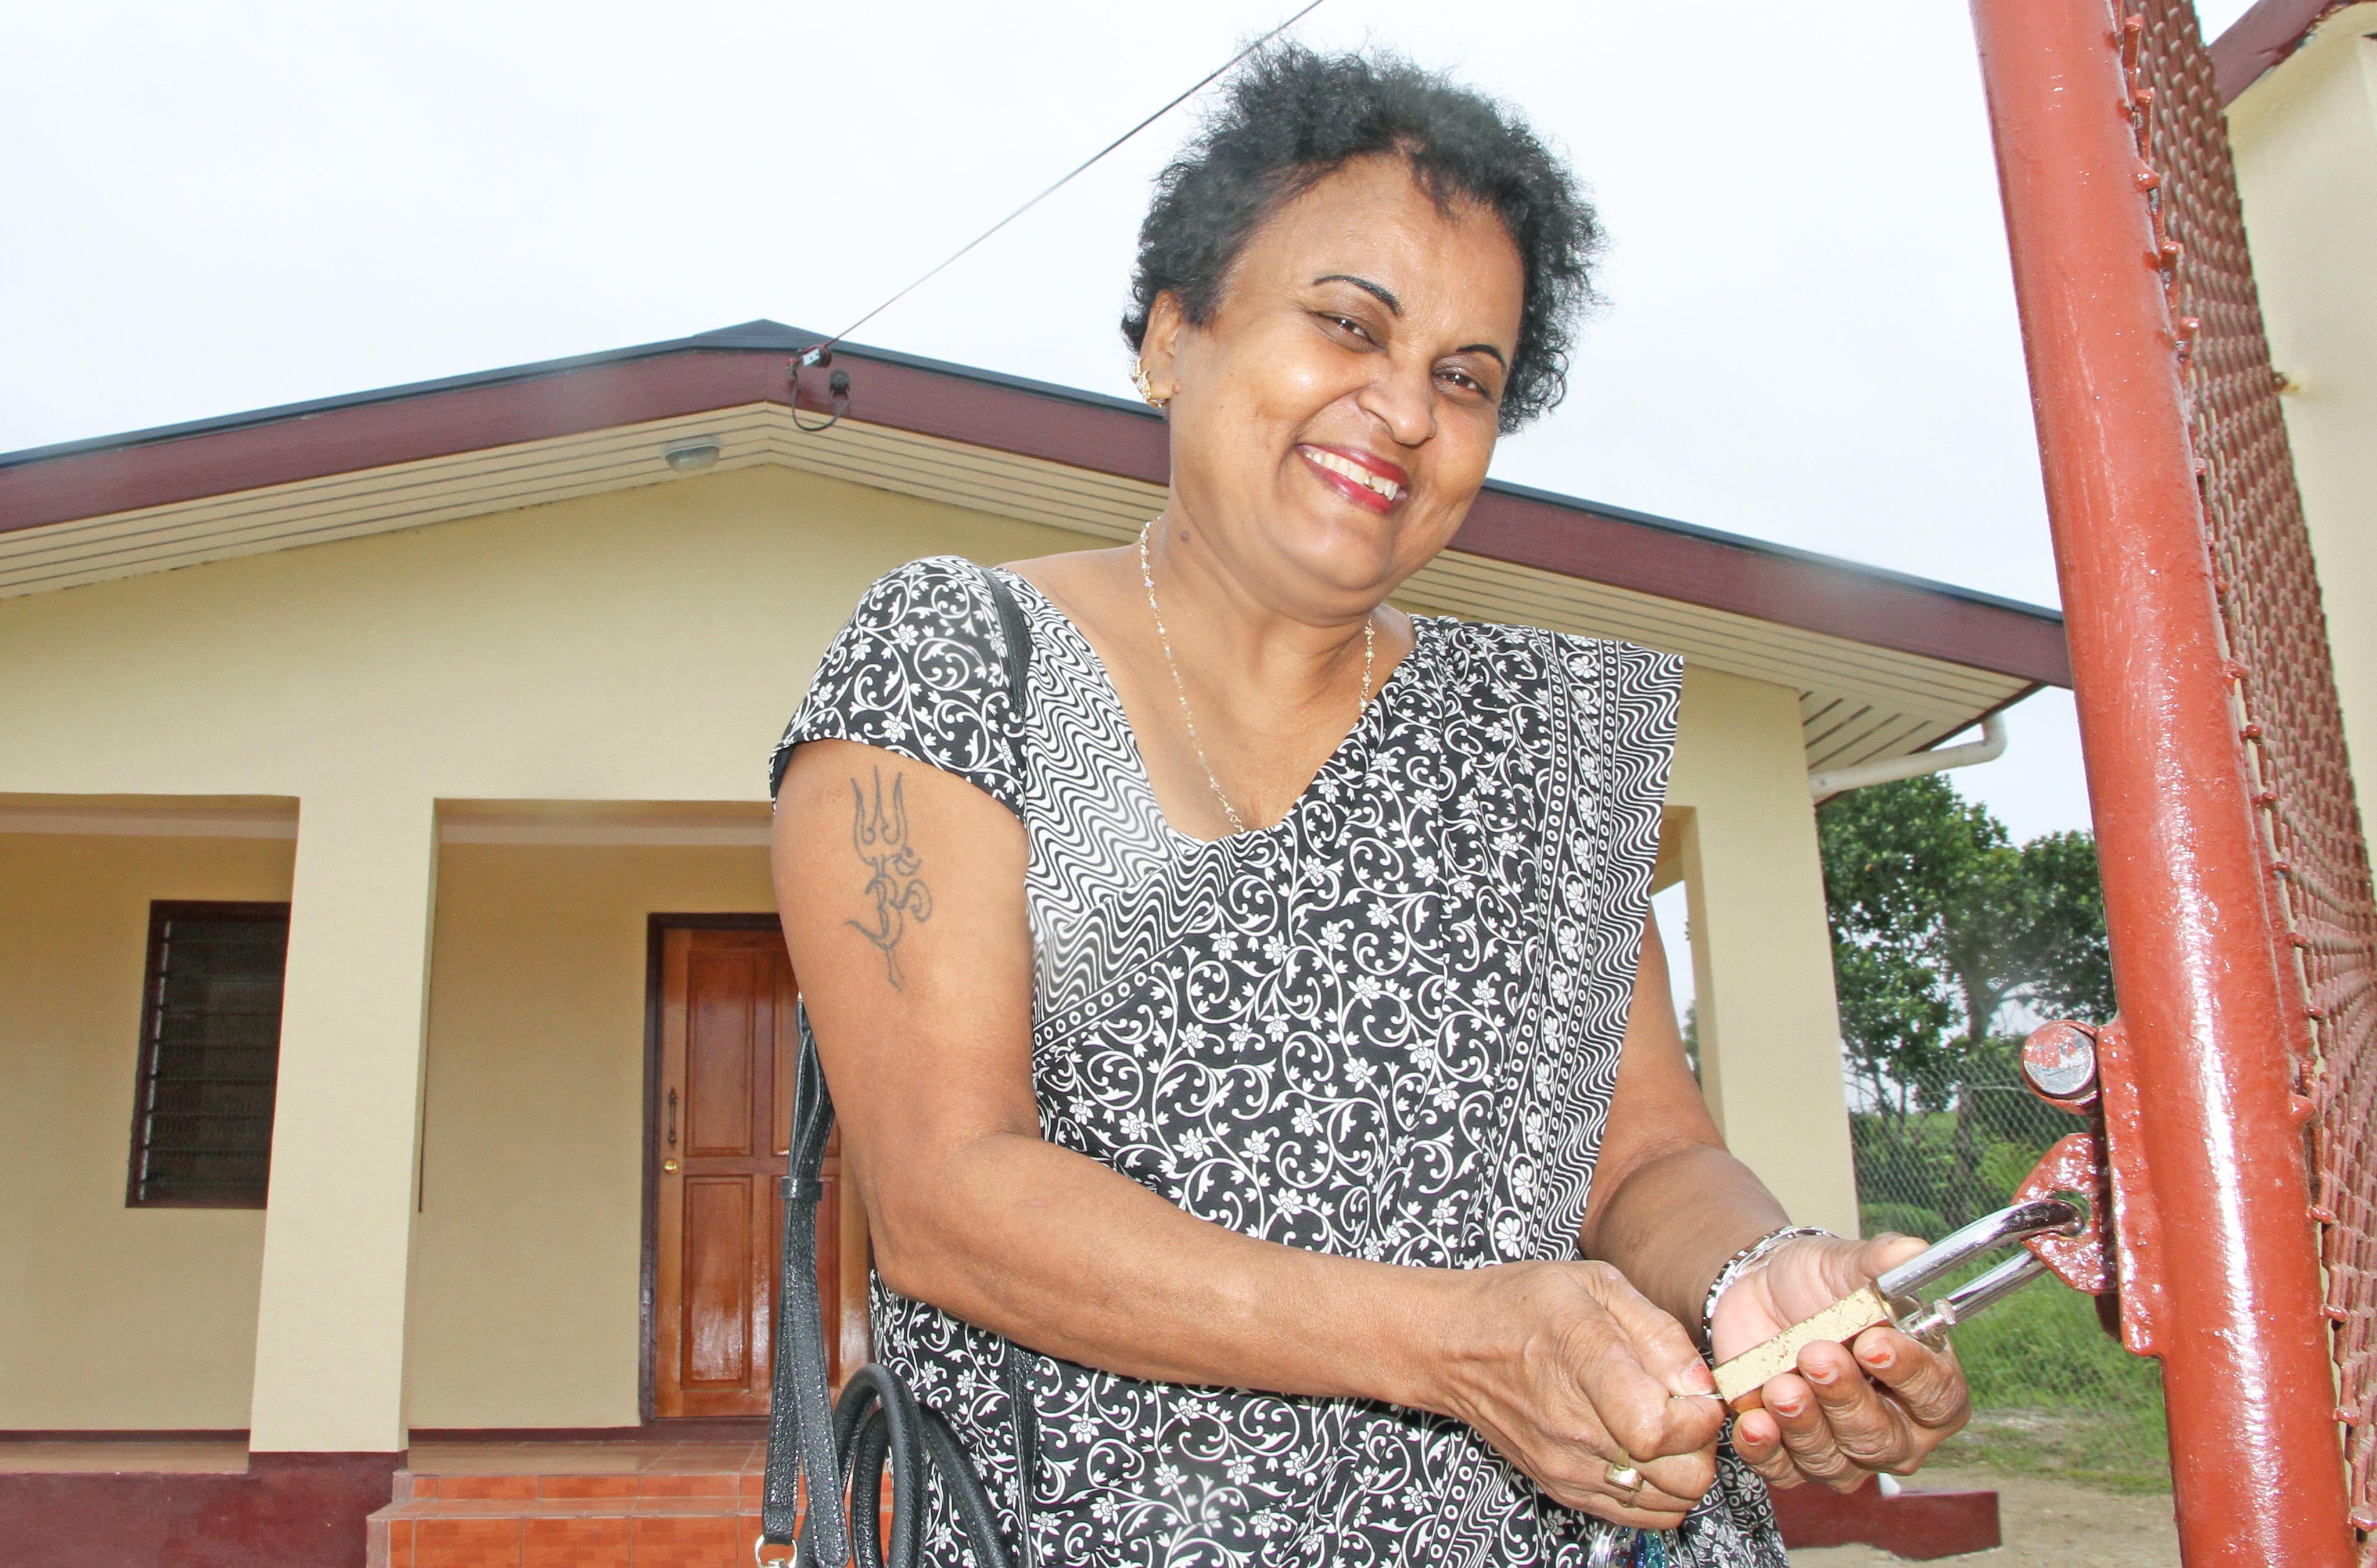 Muni Lata Kumar, 62, opens the gates to her new home at Wainibuku Subdivision, Nakasi on July 15, 2017. Photo: Ronald Kumar